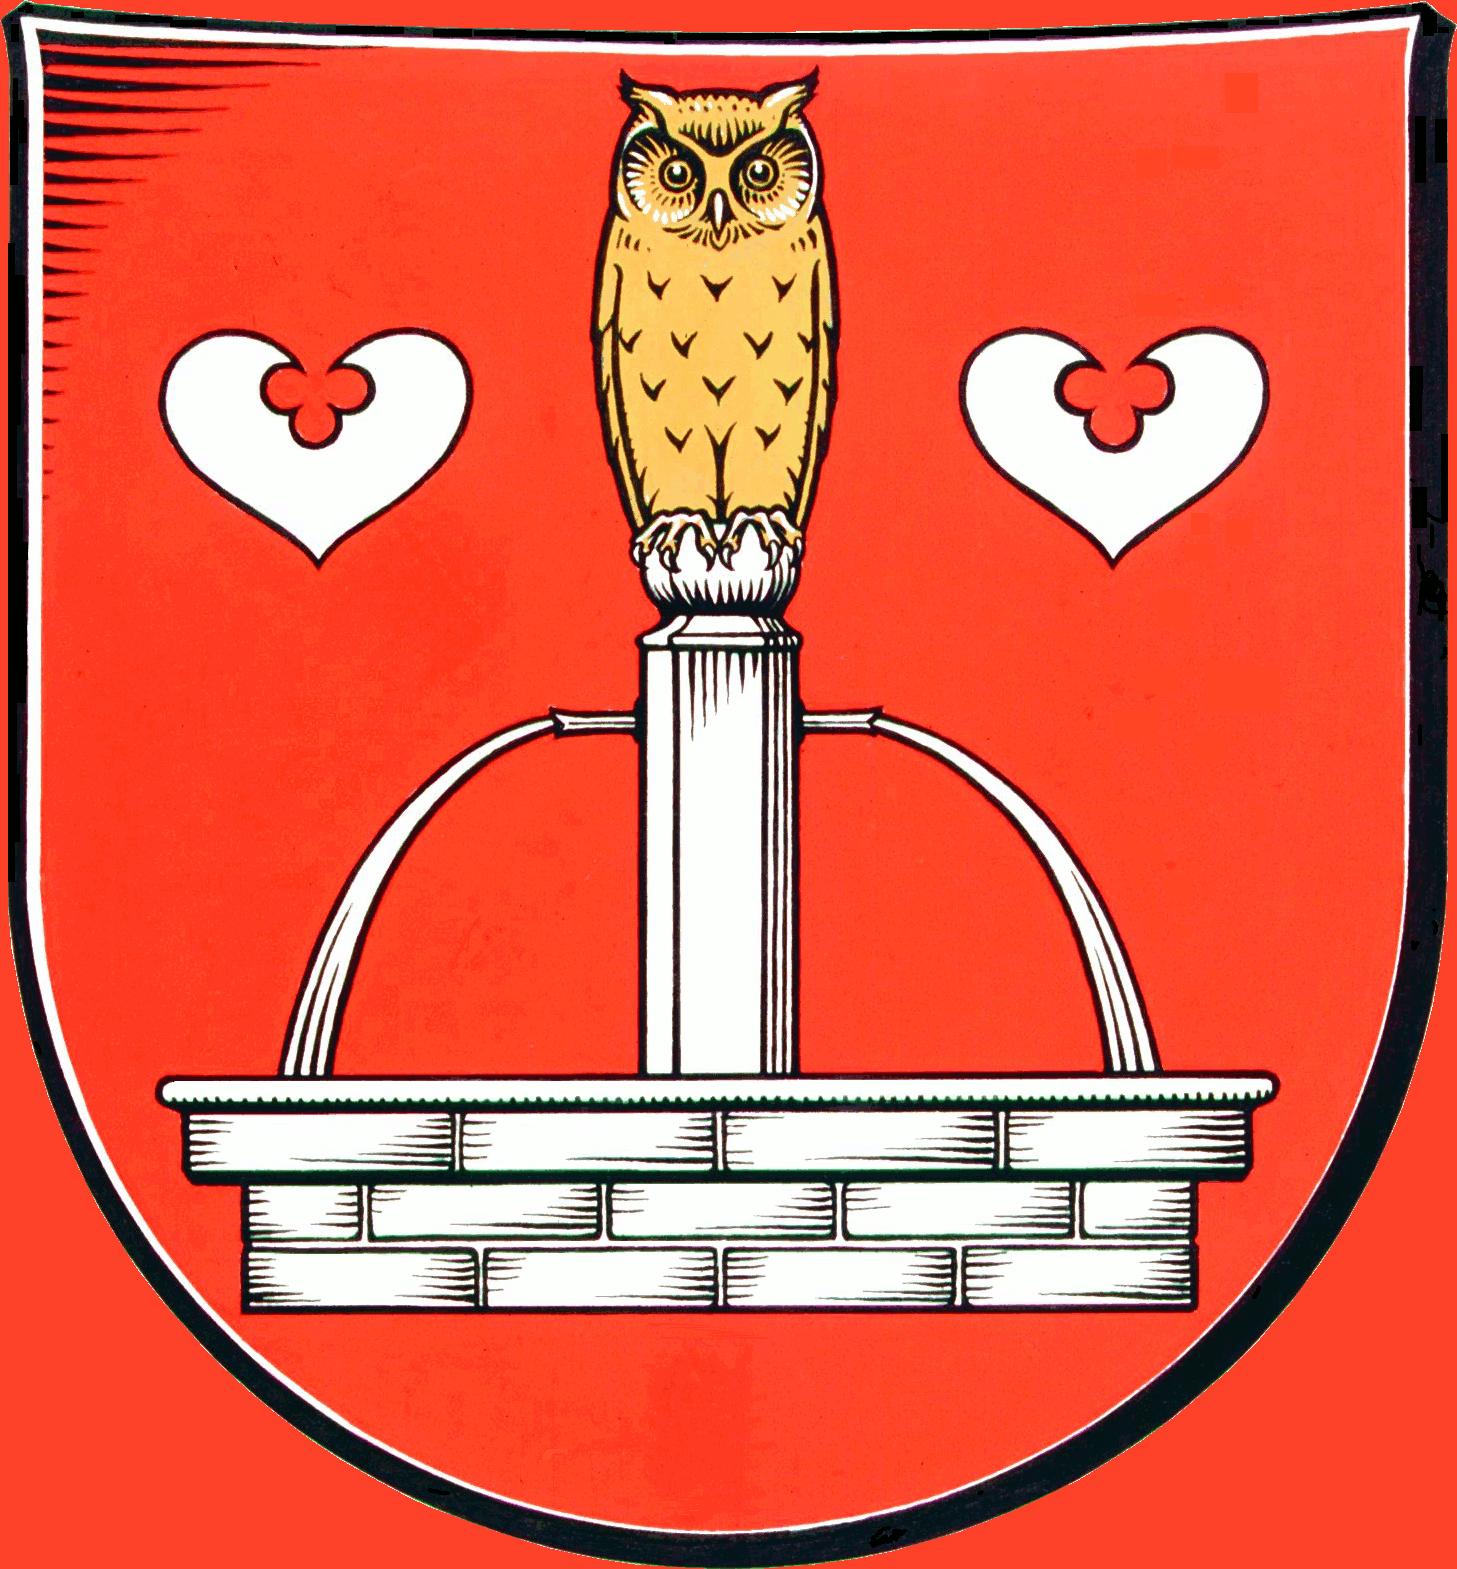 Gemeinde Bönningstedt